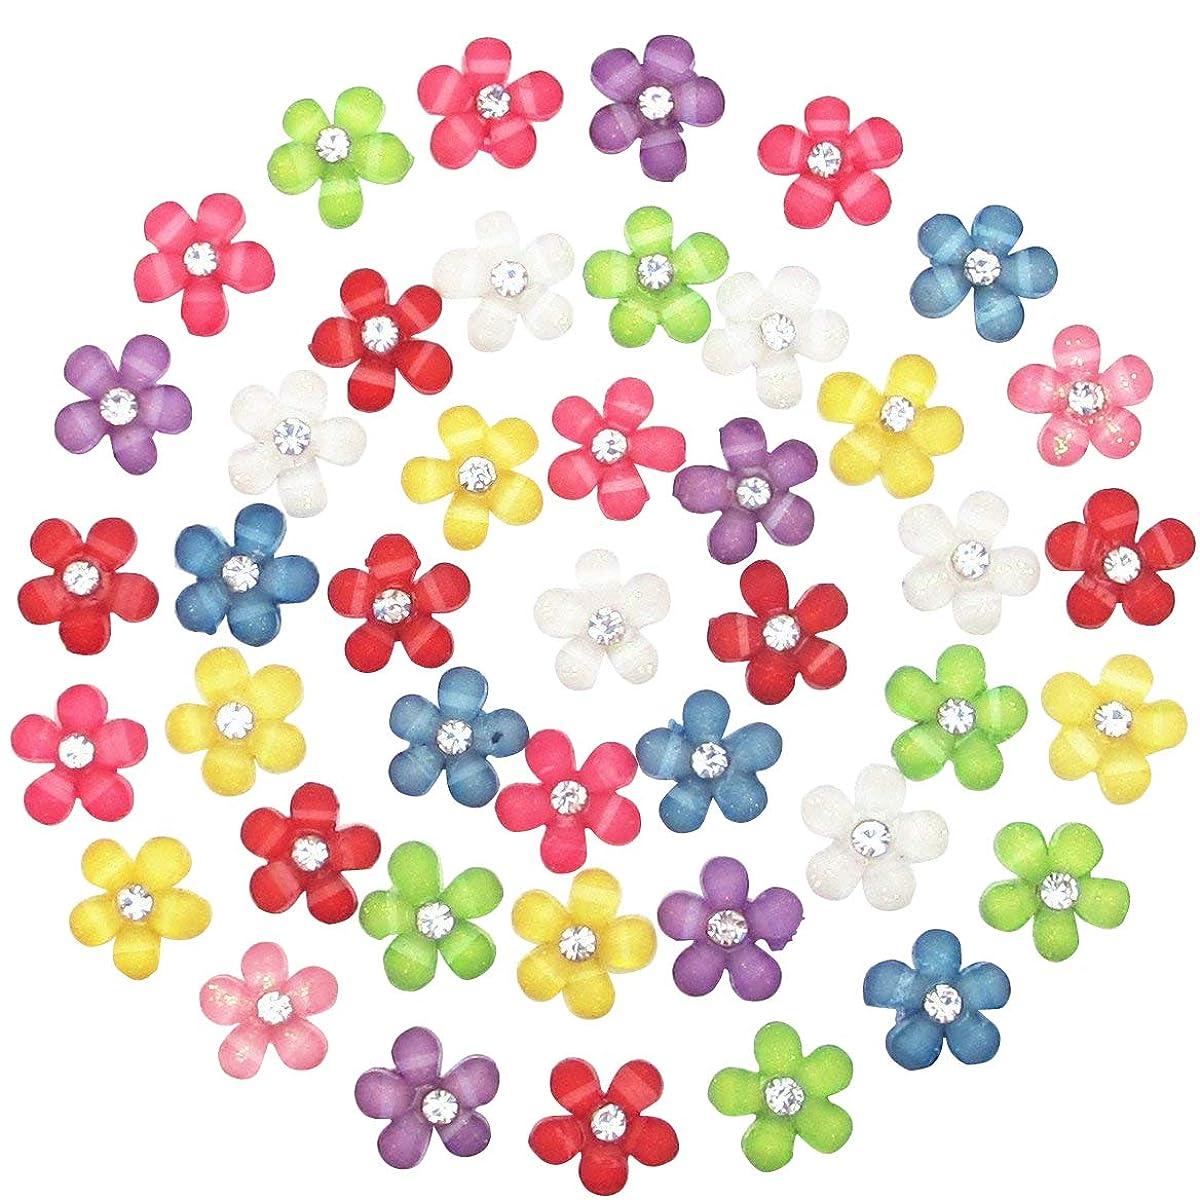 Dandan DIY 80pcs 10mm(0.4'') Mini Resin Flowers with Shiny Rhinestone Flatback Resin Buttons Resin Flatback Craft Flowers Phonecover Cards Craft Scrapbooking